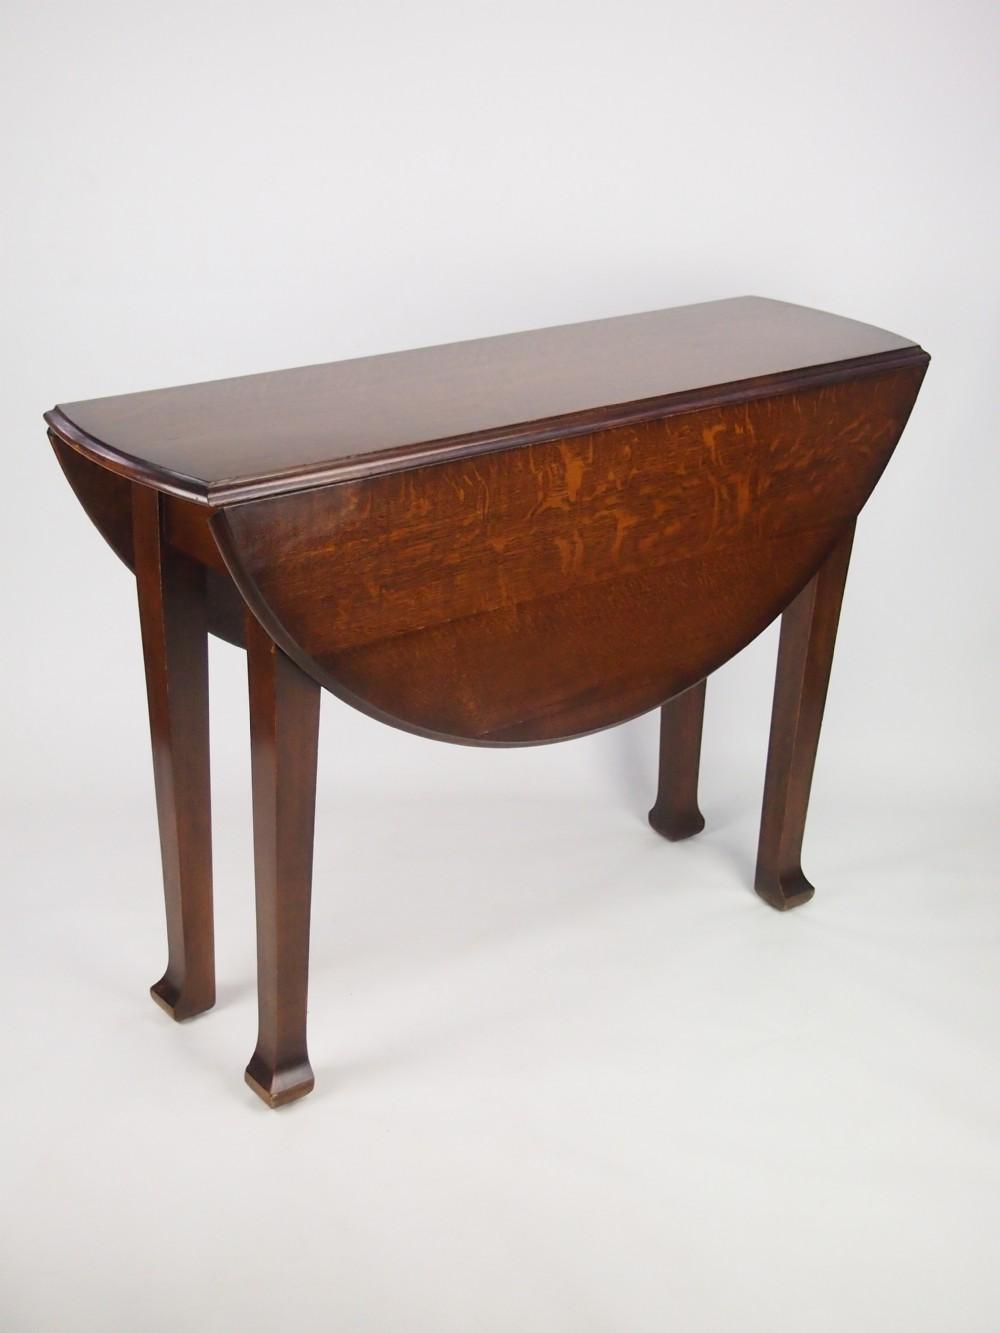 Antique Edwardian Oak Gate Leg Dining Table 254932